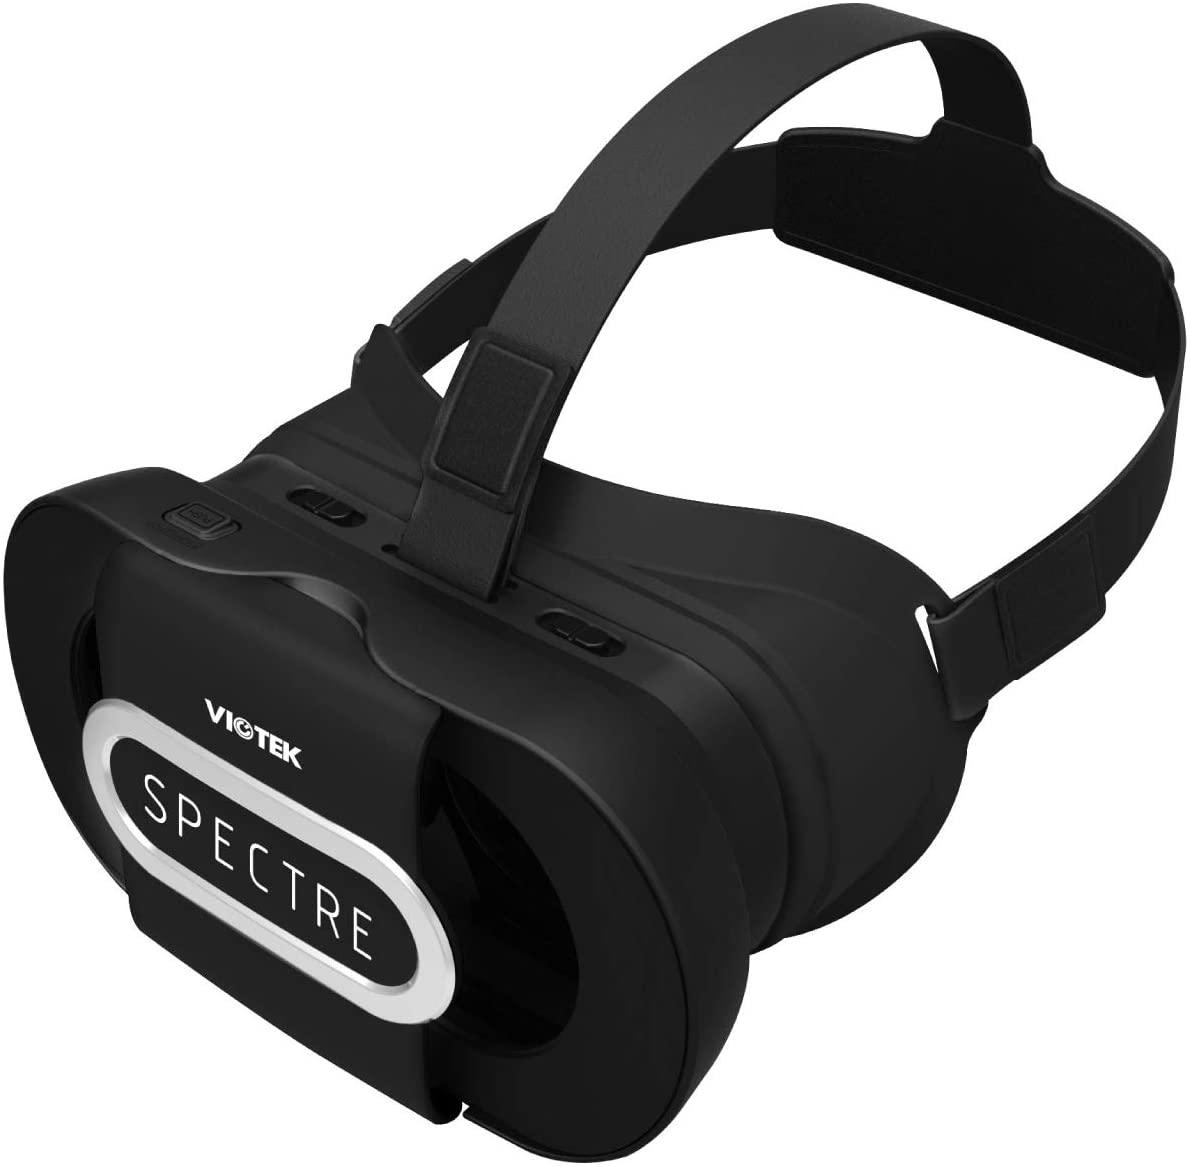 VIOTEK Spectre - VR Headset for Smartphones